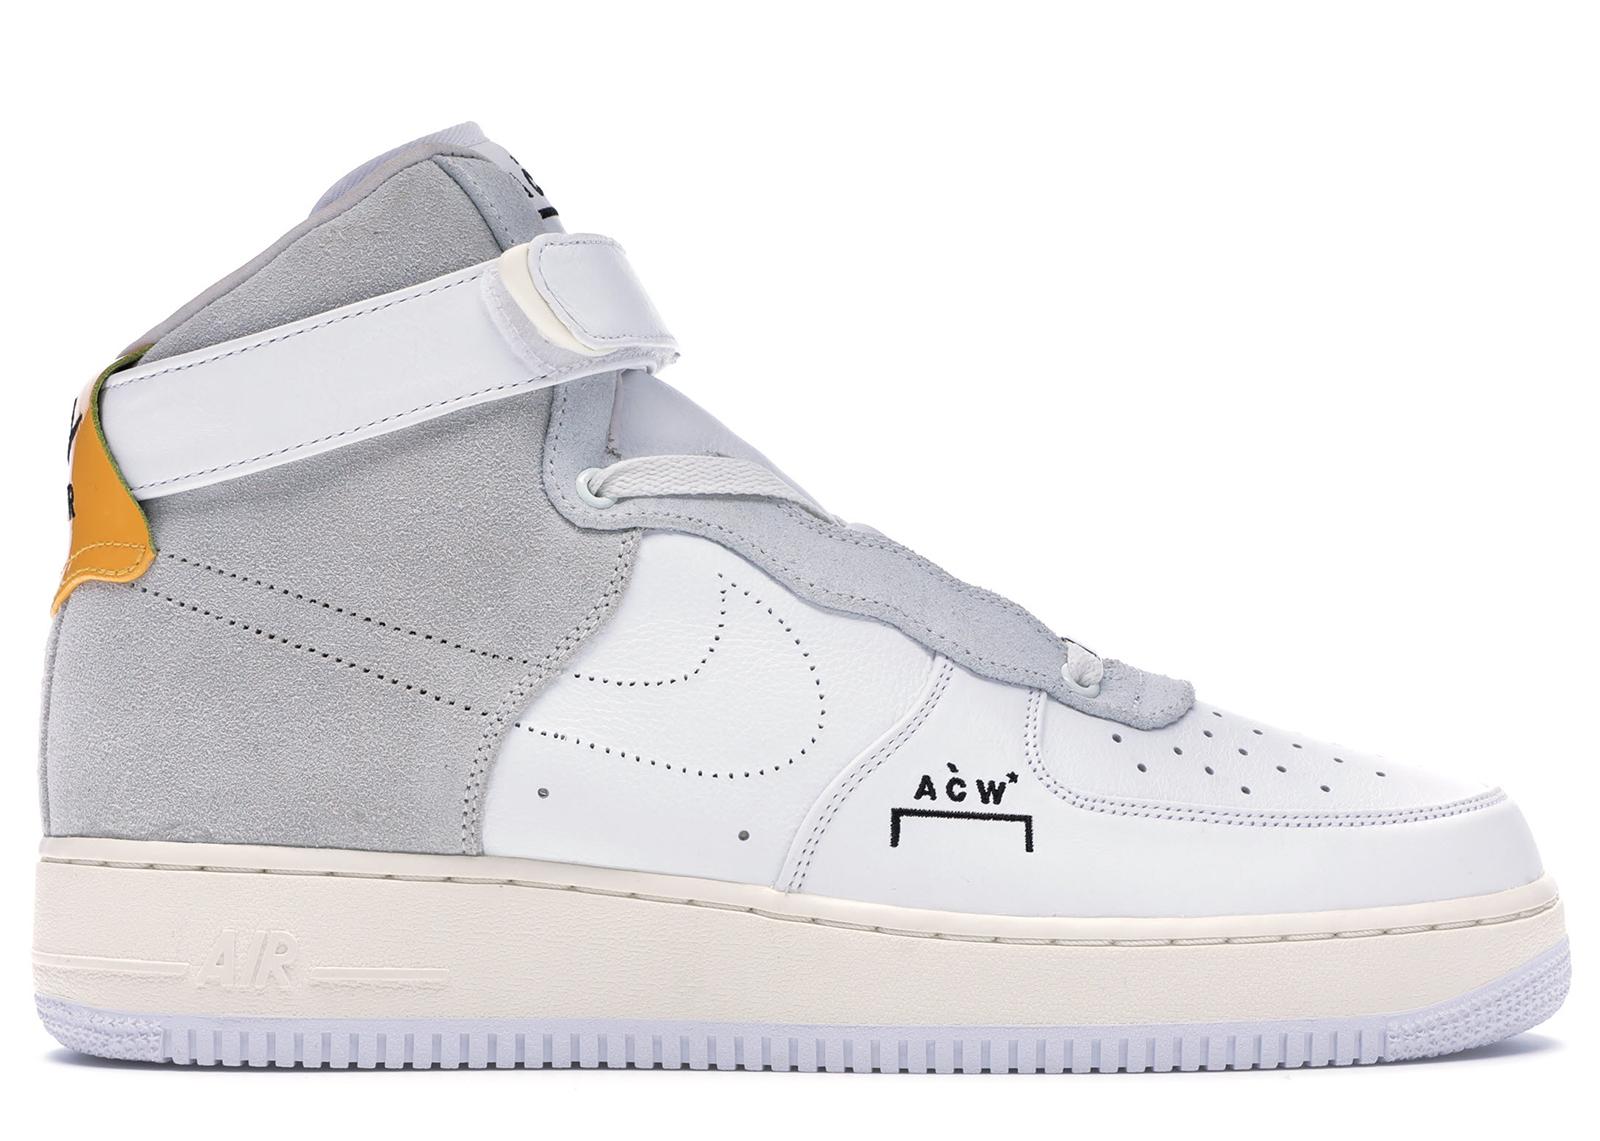 Nike Air Force 1 High A-COLD-WALL